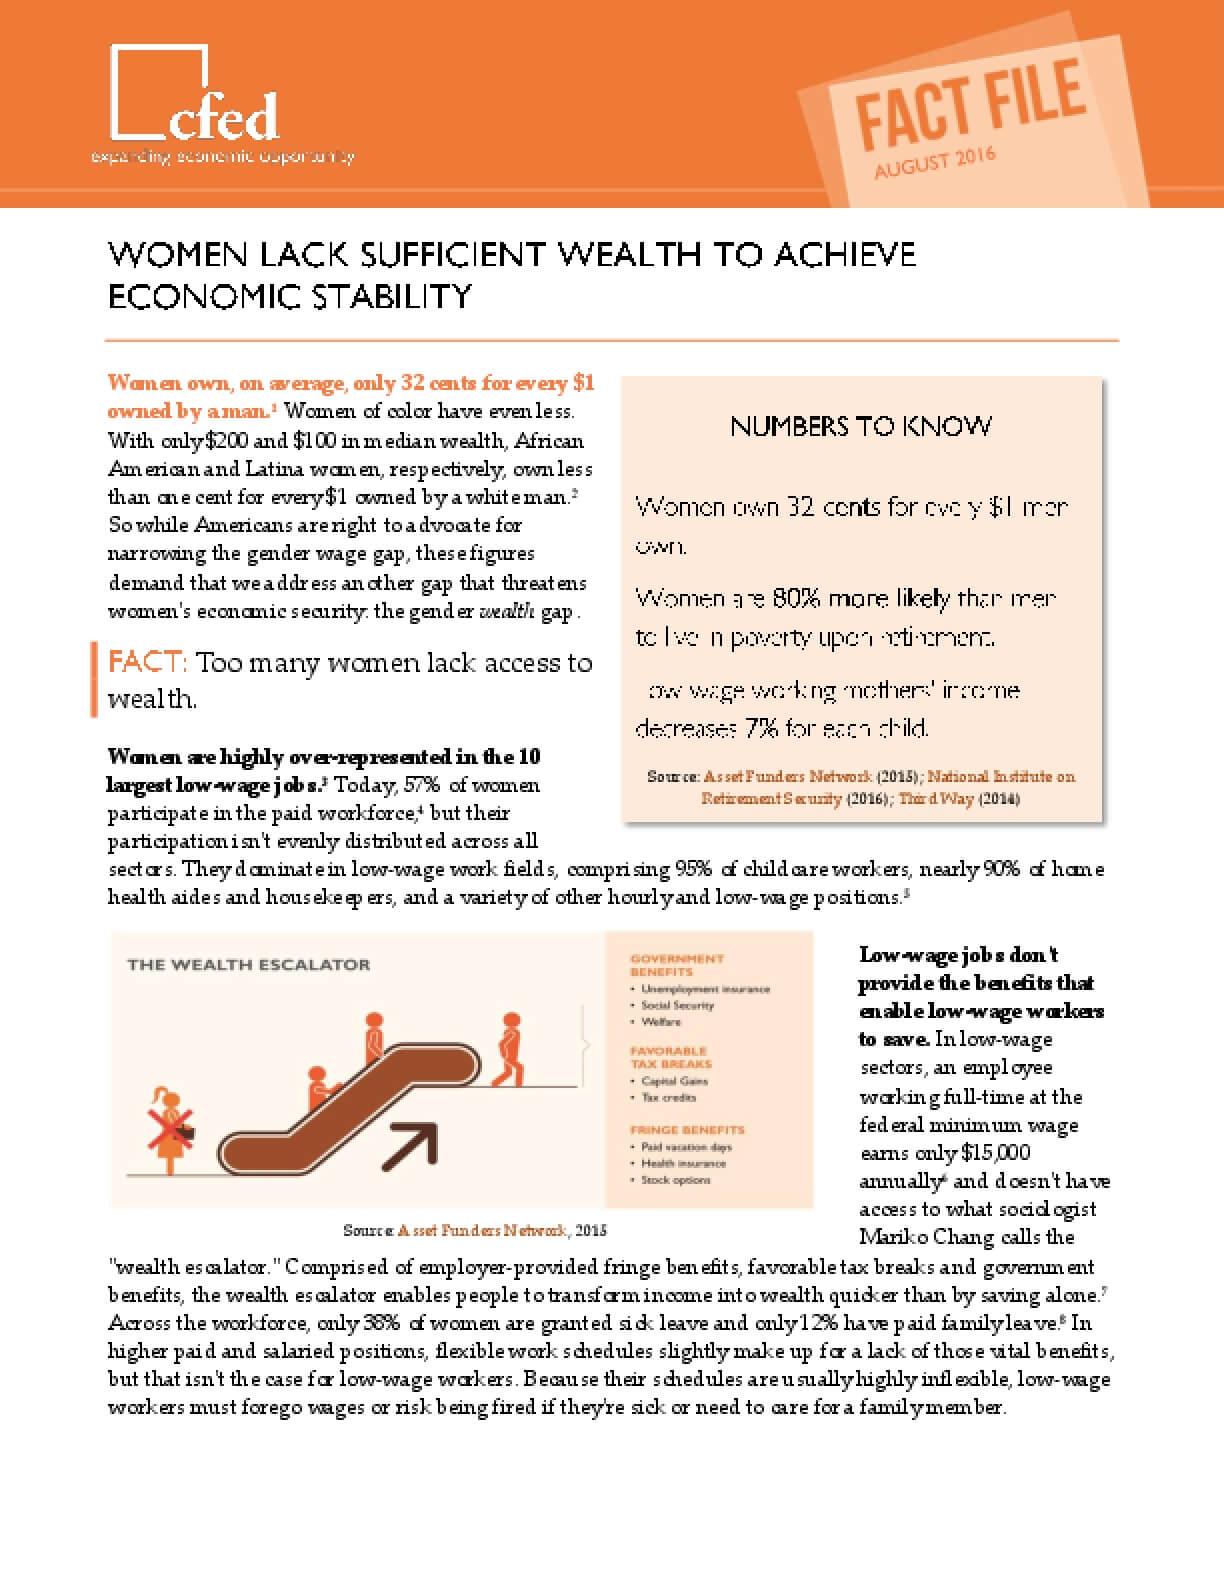 Women Lack Sufficient Wealth to Achieve Economic Stability